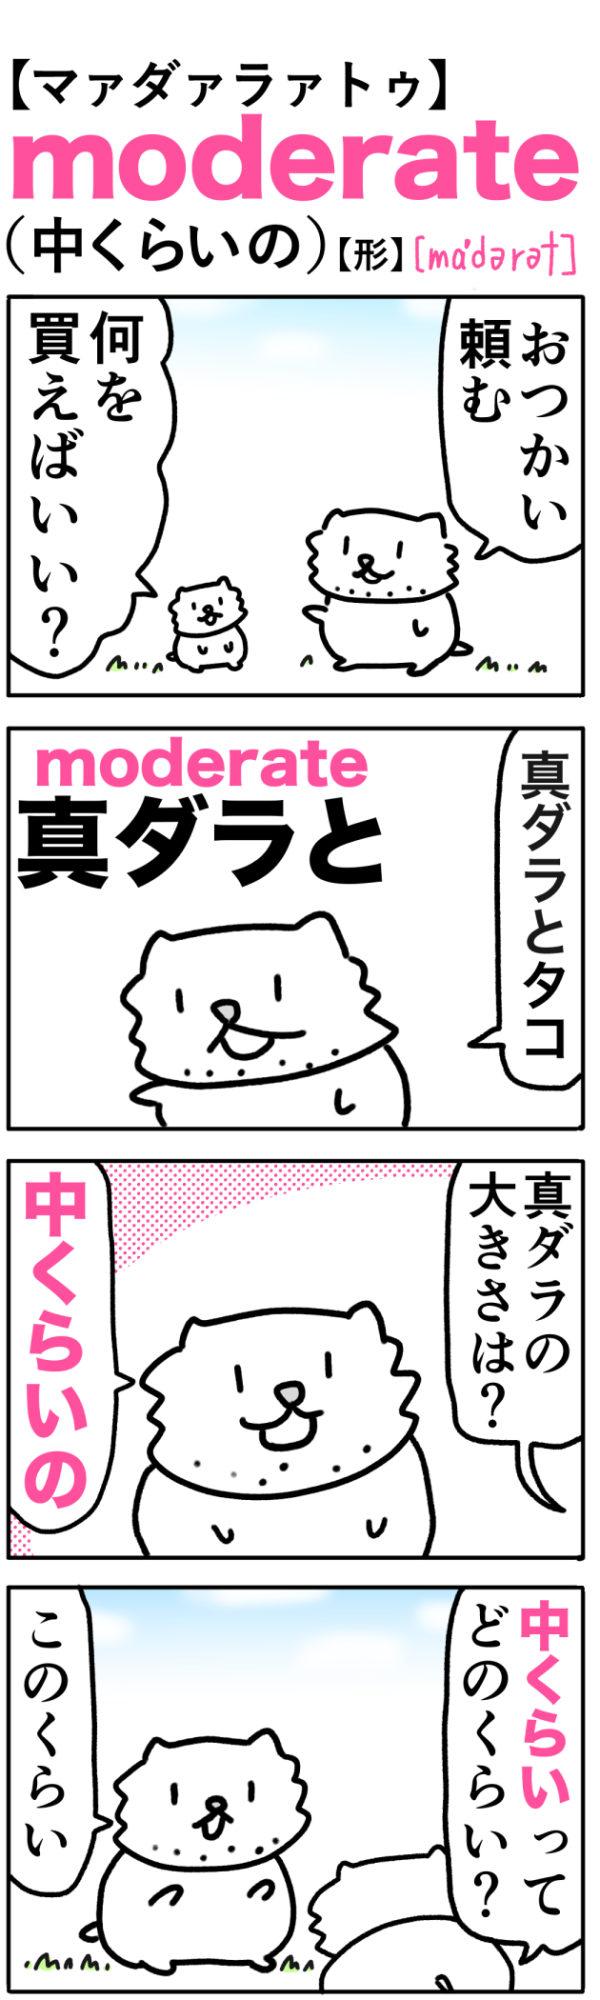 moderate(中くらいの)の語呂合わせ英単語